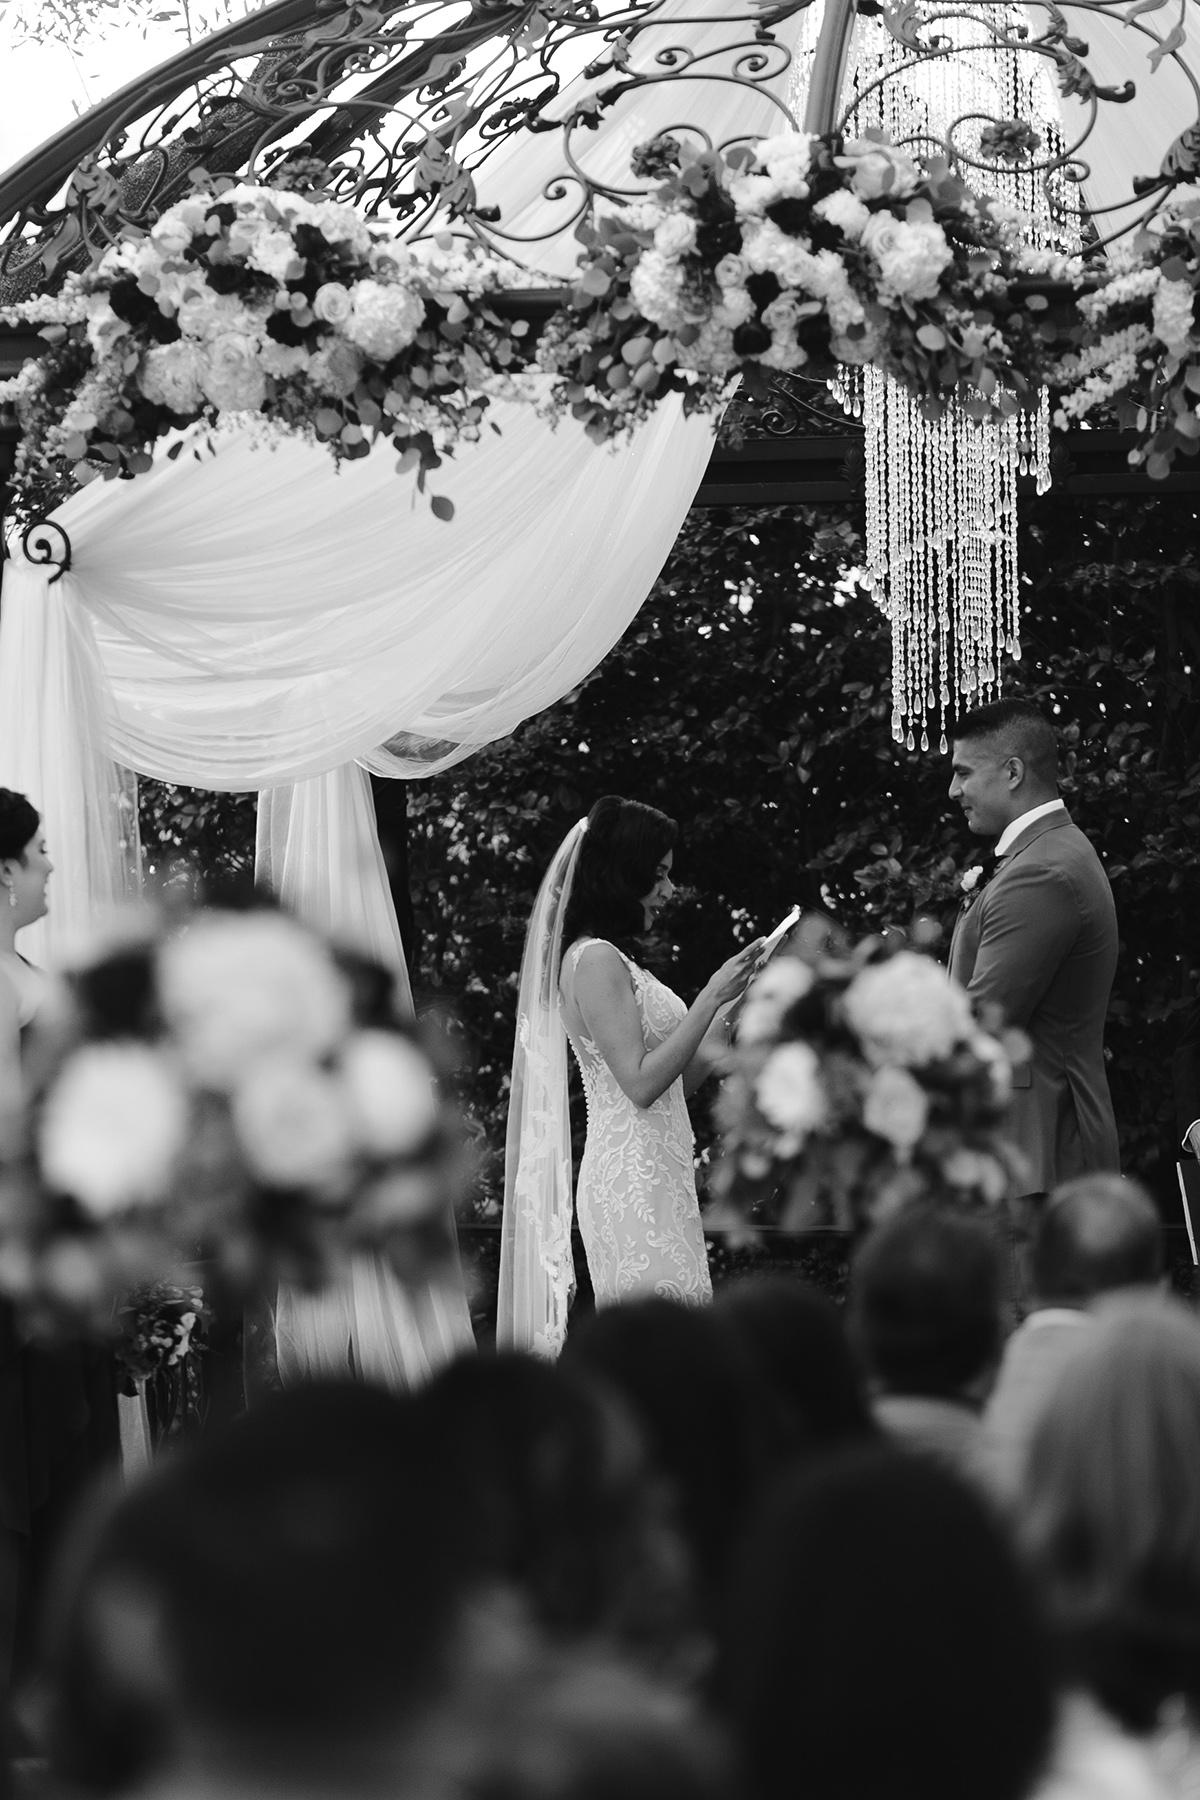 karla_tommy_wedding_045.jpg